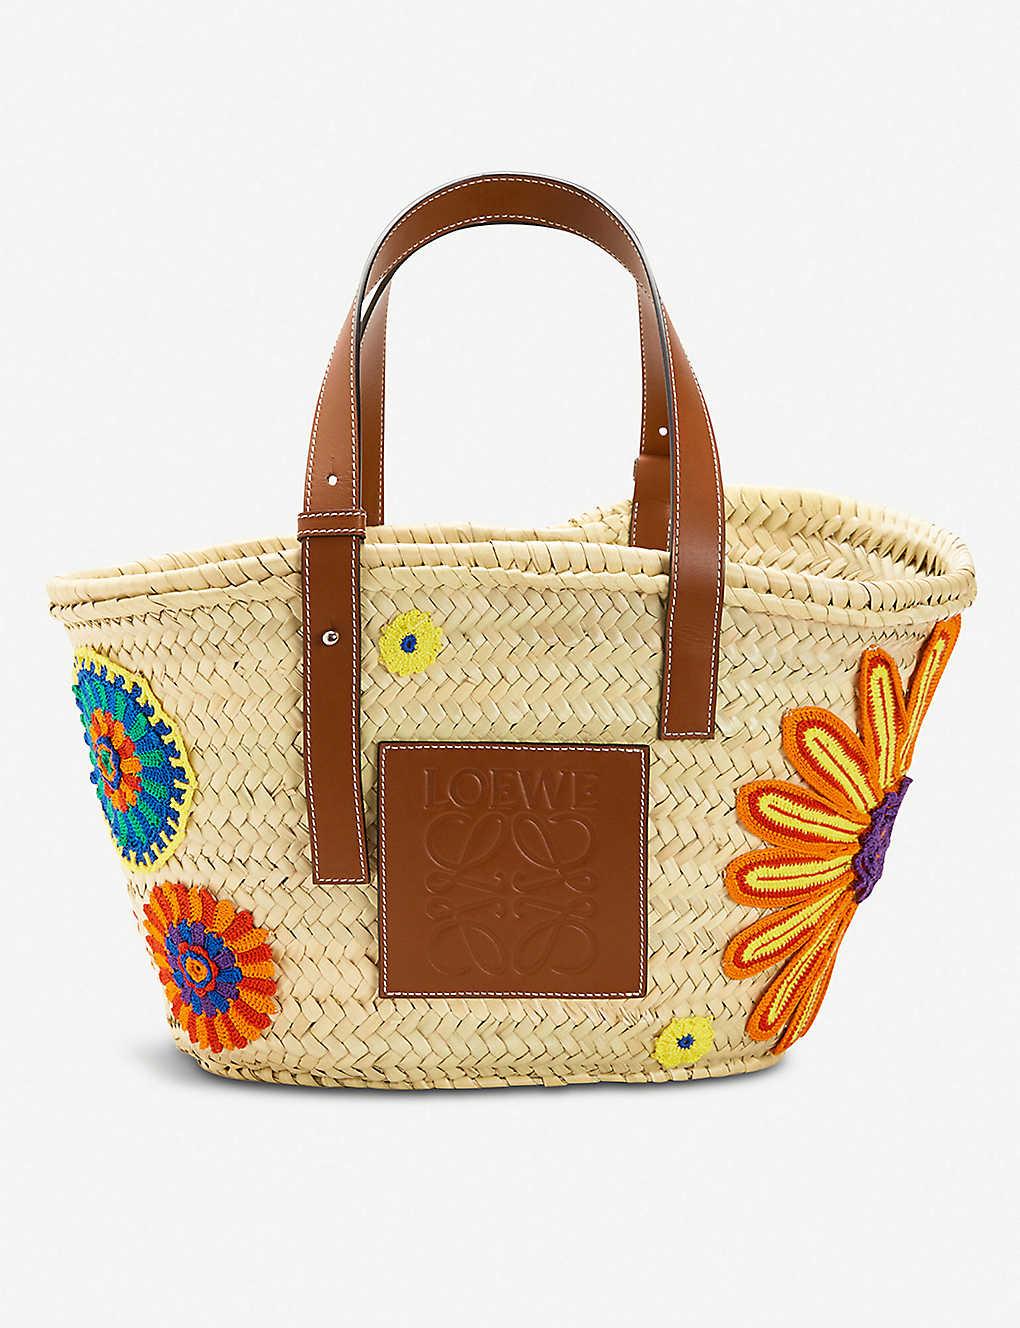 b5cdc49424b LOEWE - Flowers large raffia and leather basket bag   Selfridges.com